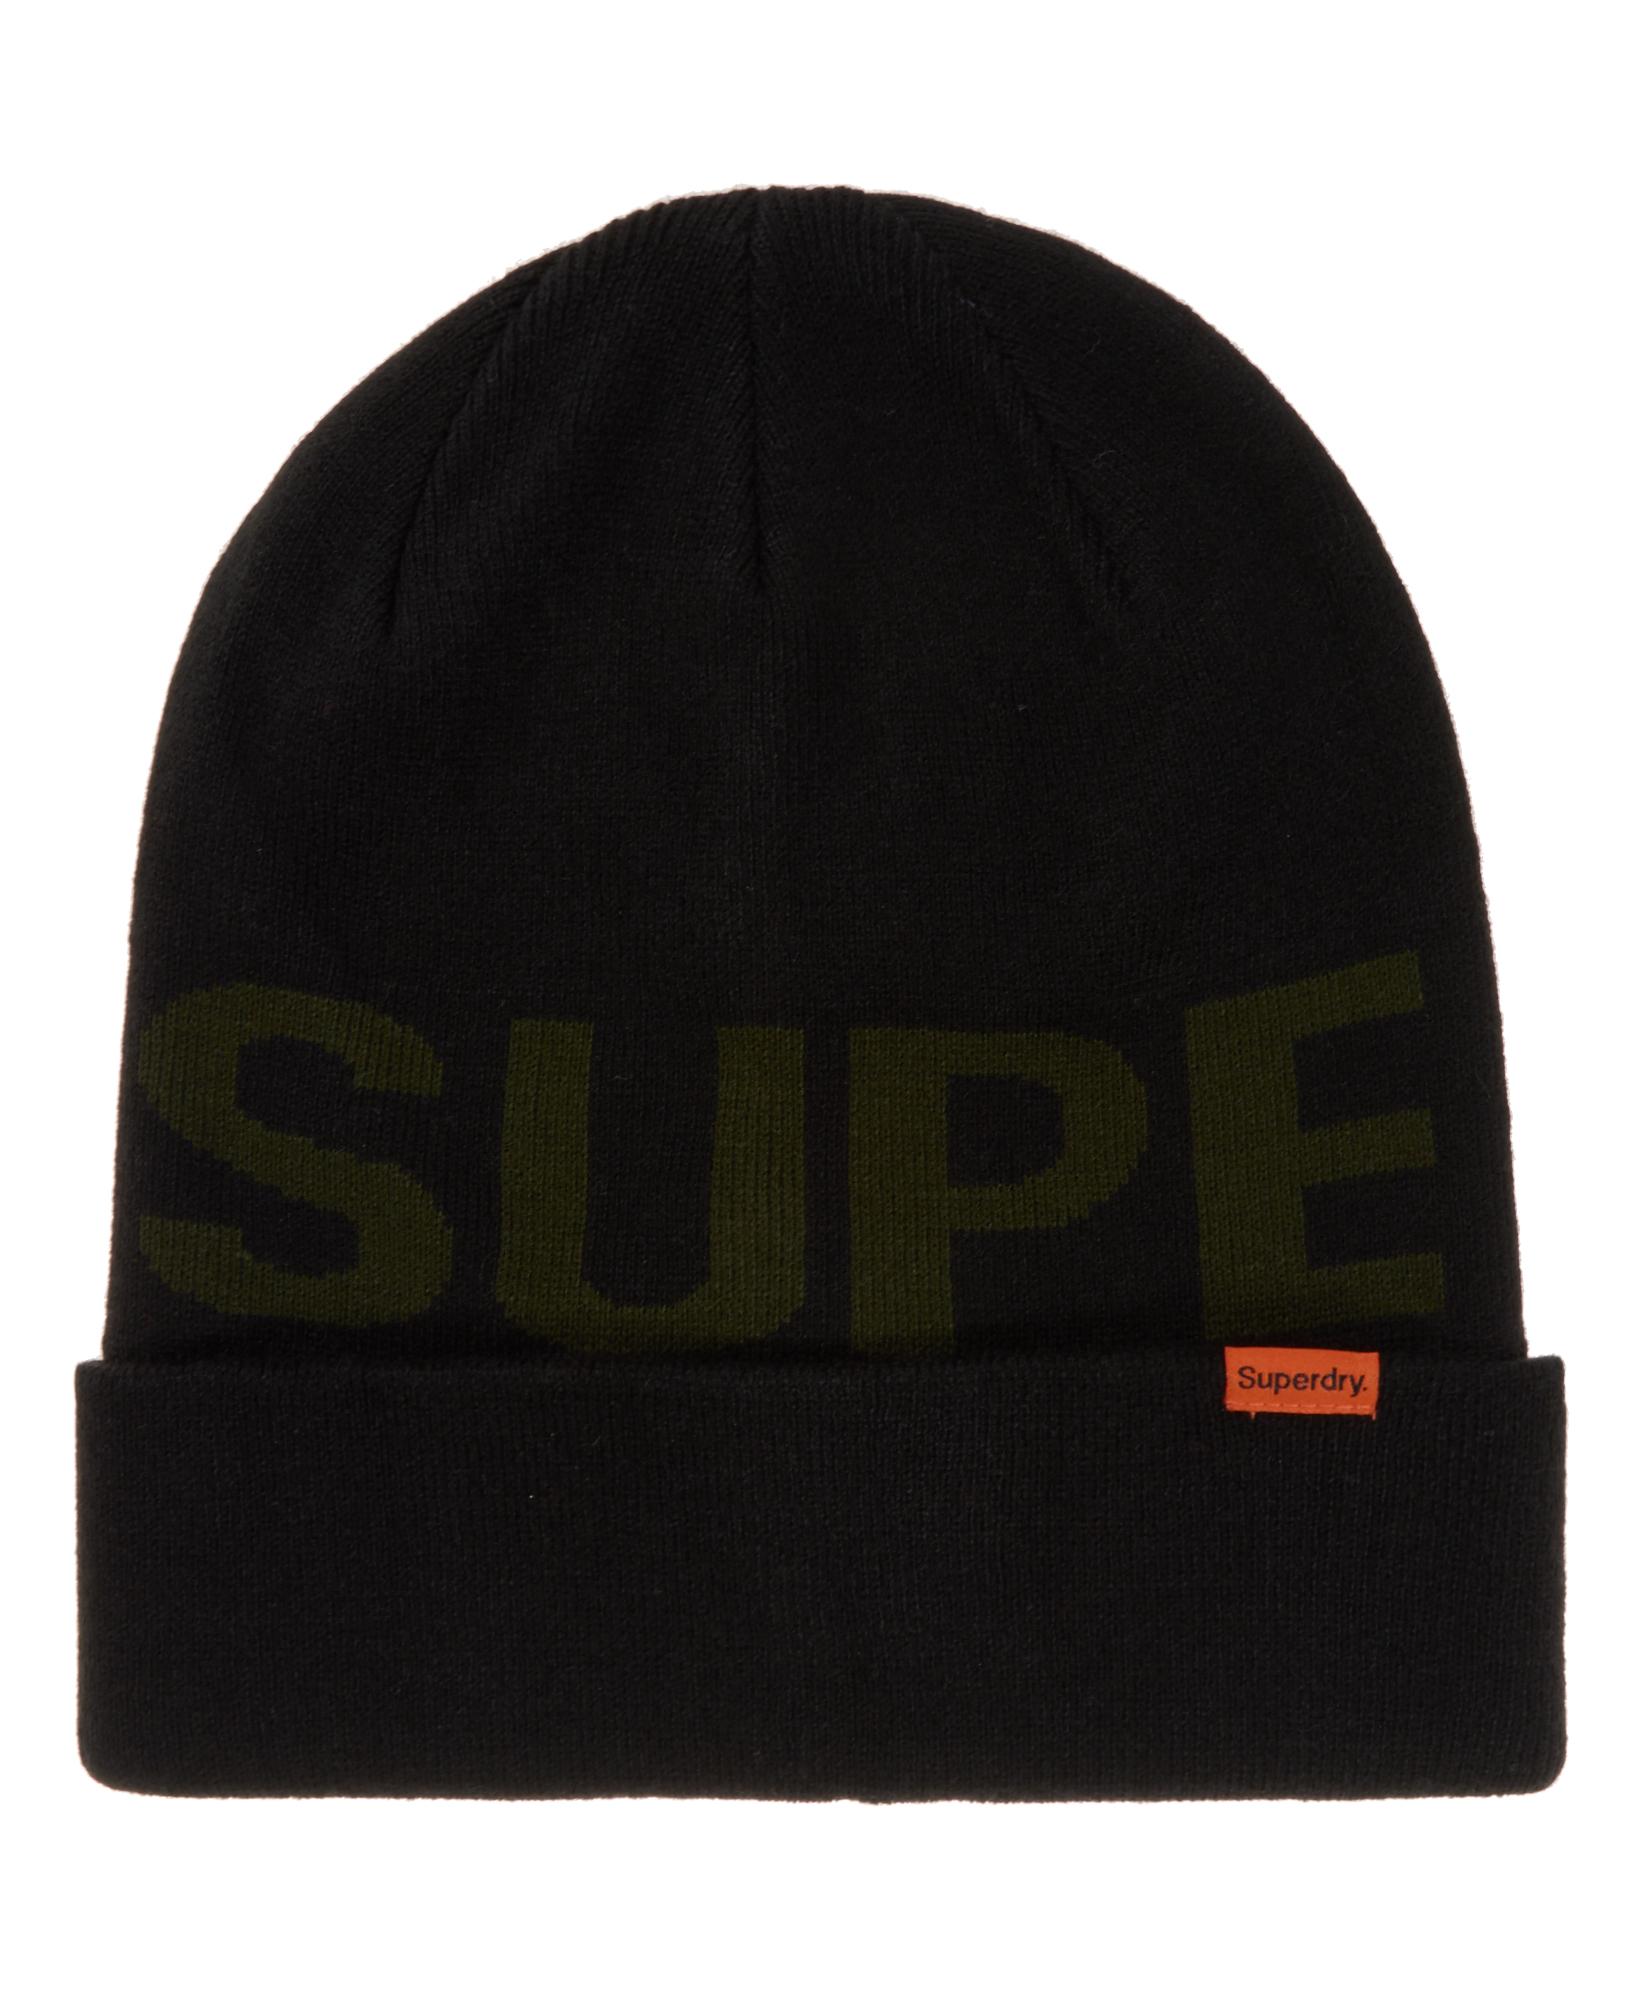 Sentinel New Mens Superdry Superdry Logo Beanie Black 87370e0482db